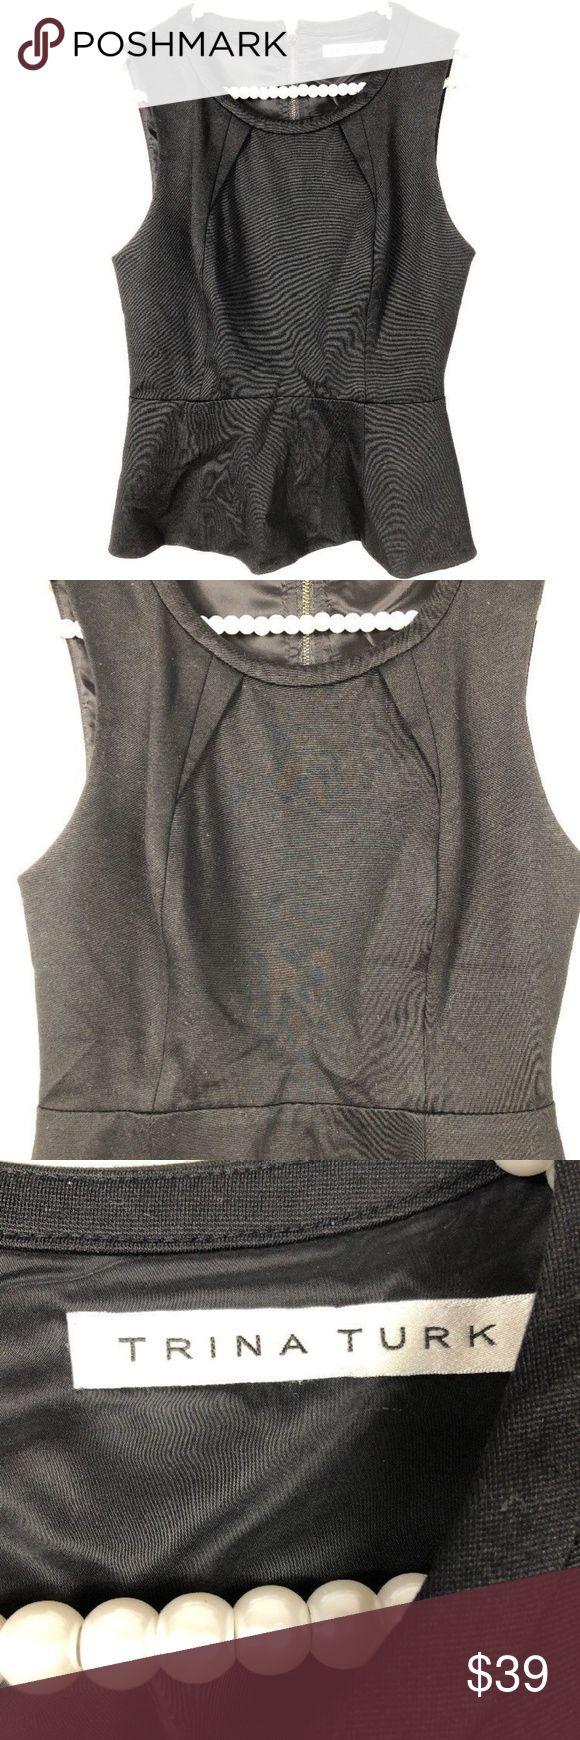 "TRINA TURK Womens M Black Top Back Zip Casual Wear TRINA TURK Womens S Small? Black Peplum Top Back Zip Career Casual Wear  pit to pit 16.5"" length from shoulder 22"" Trina Turk Tops Blouses"